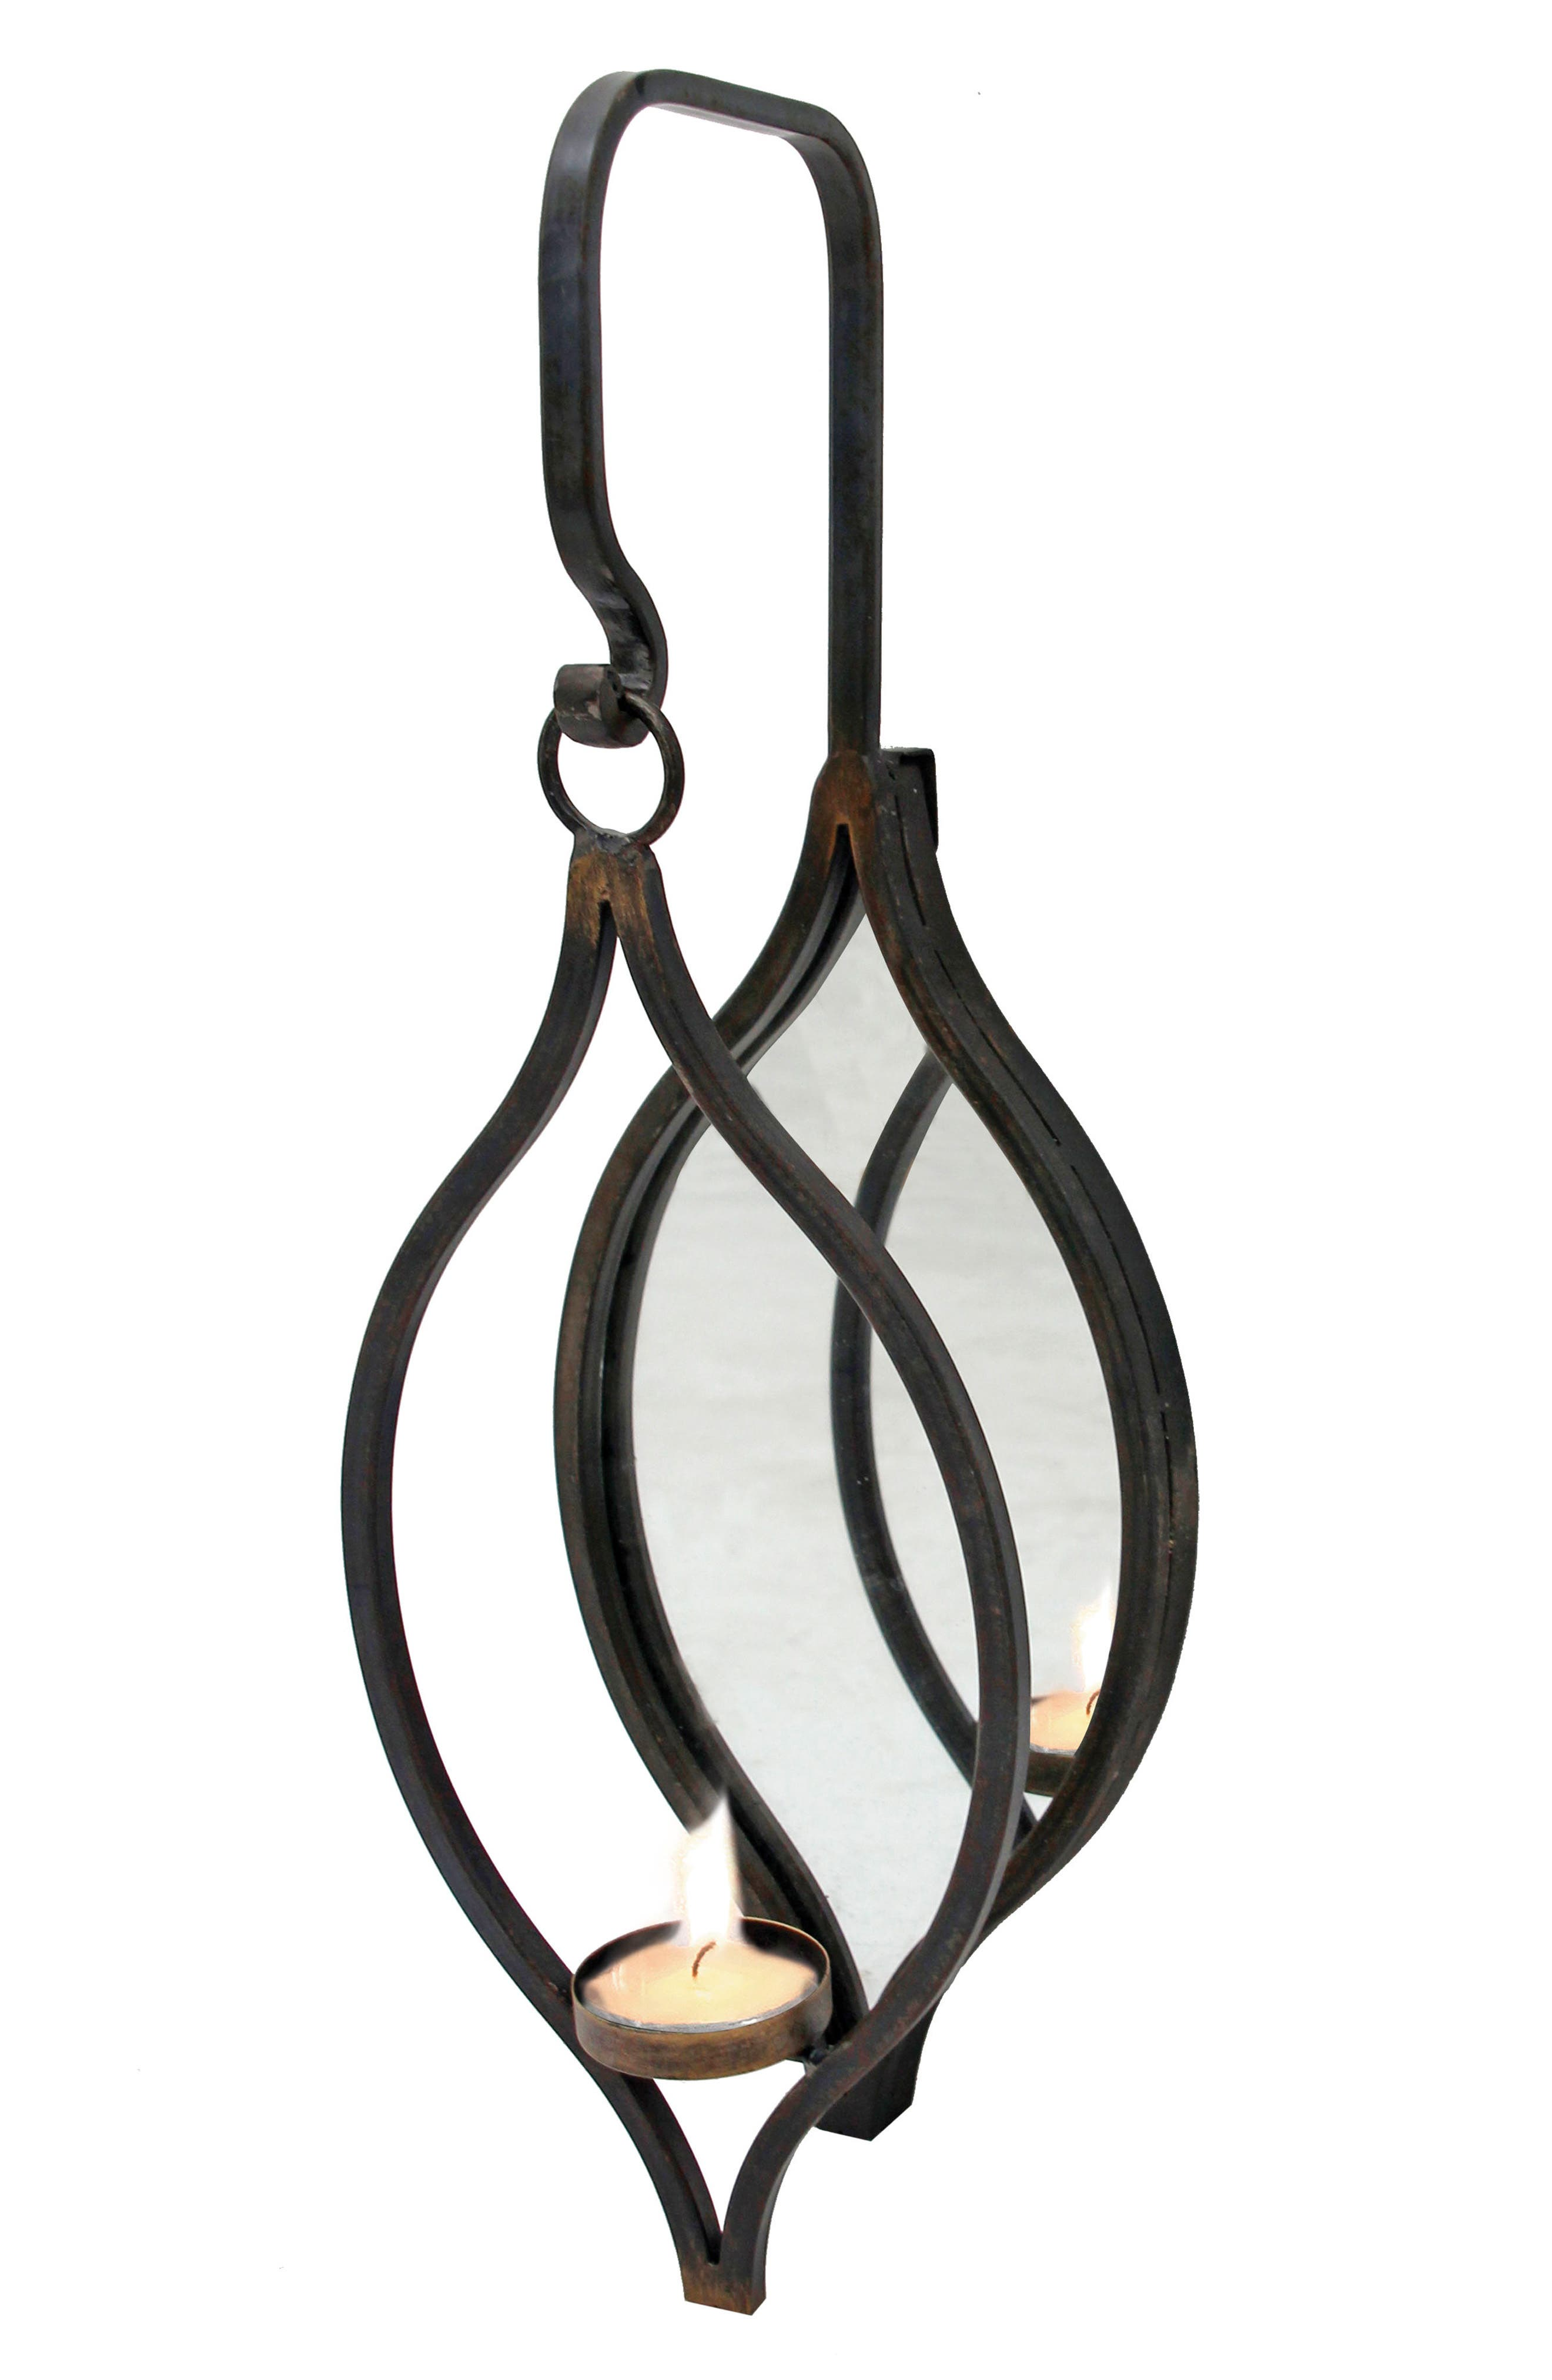 Alternate Image 1 Selected - Foreside Hanging Tea Light Holder